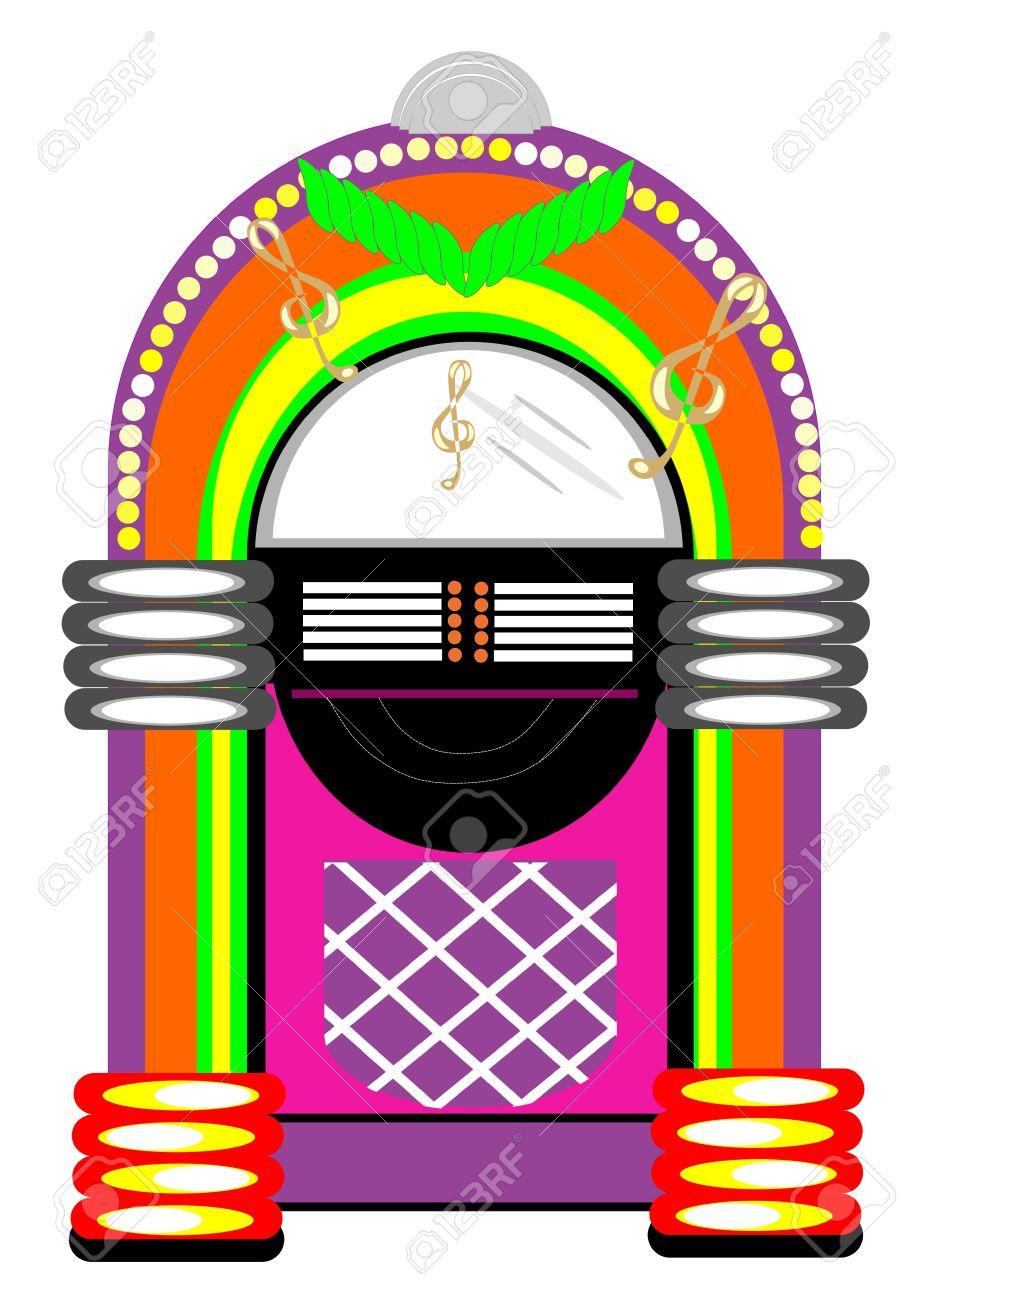 hight resolution of retro jukebox illustration stock vector 10038580